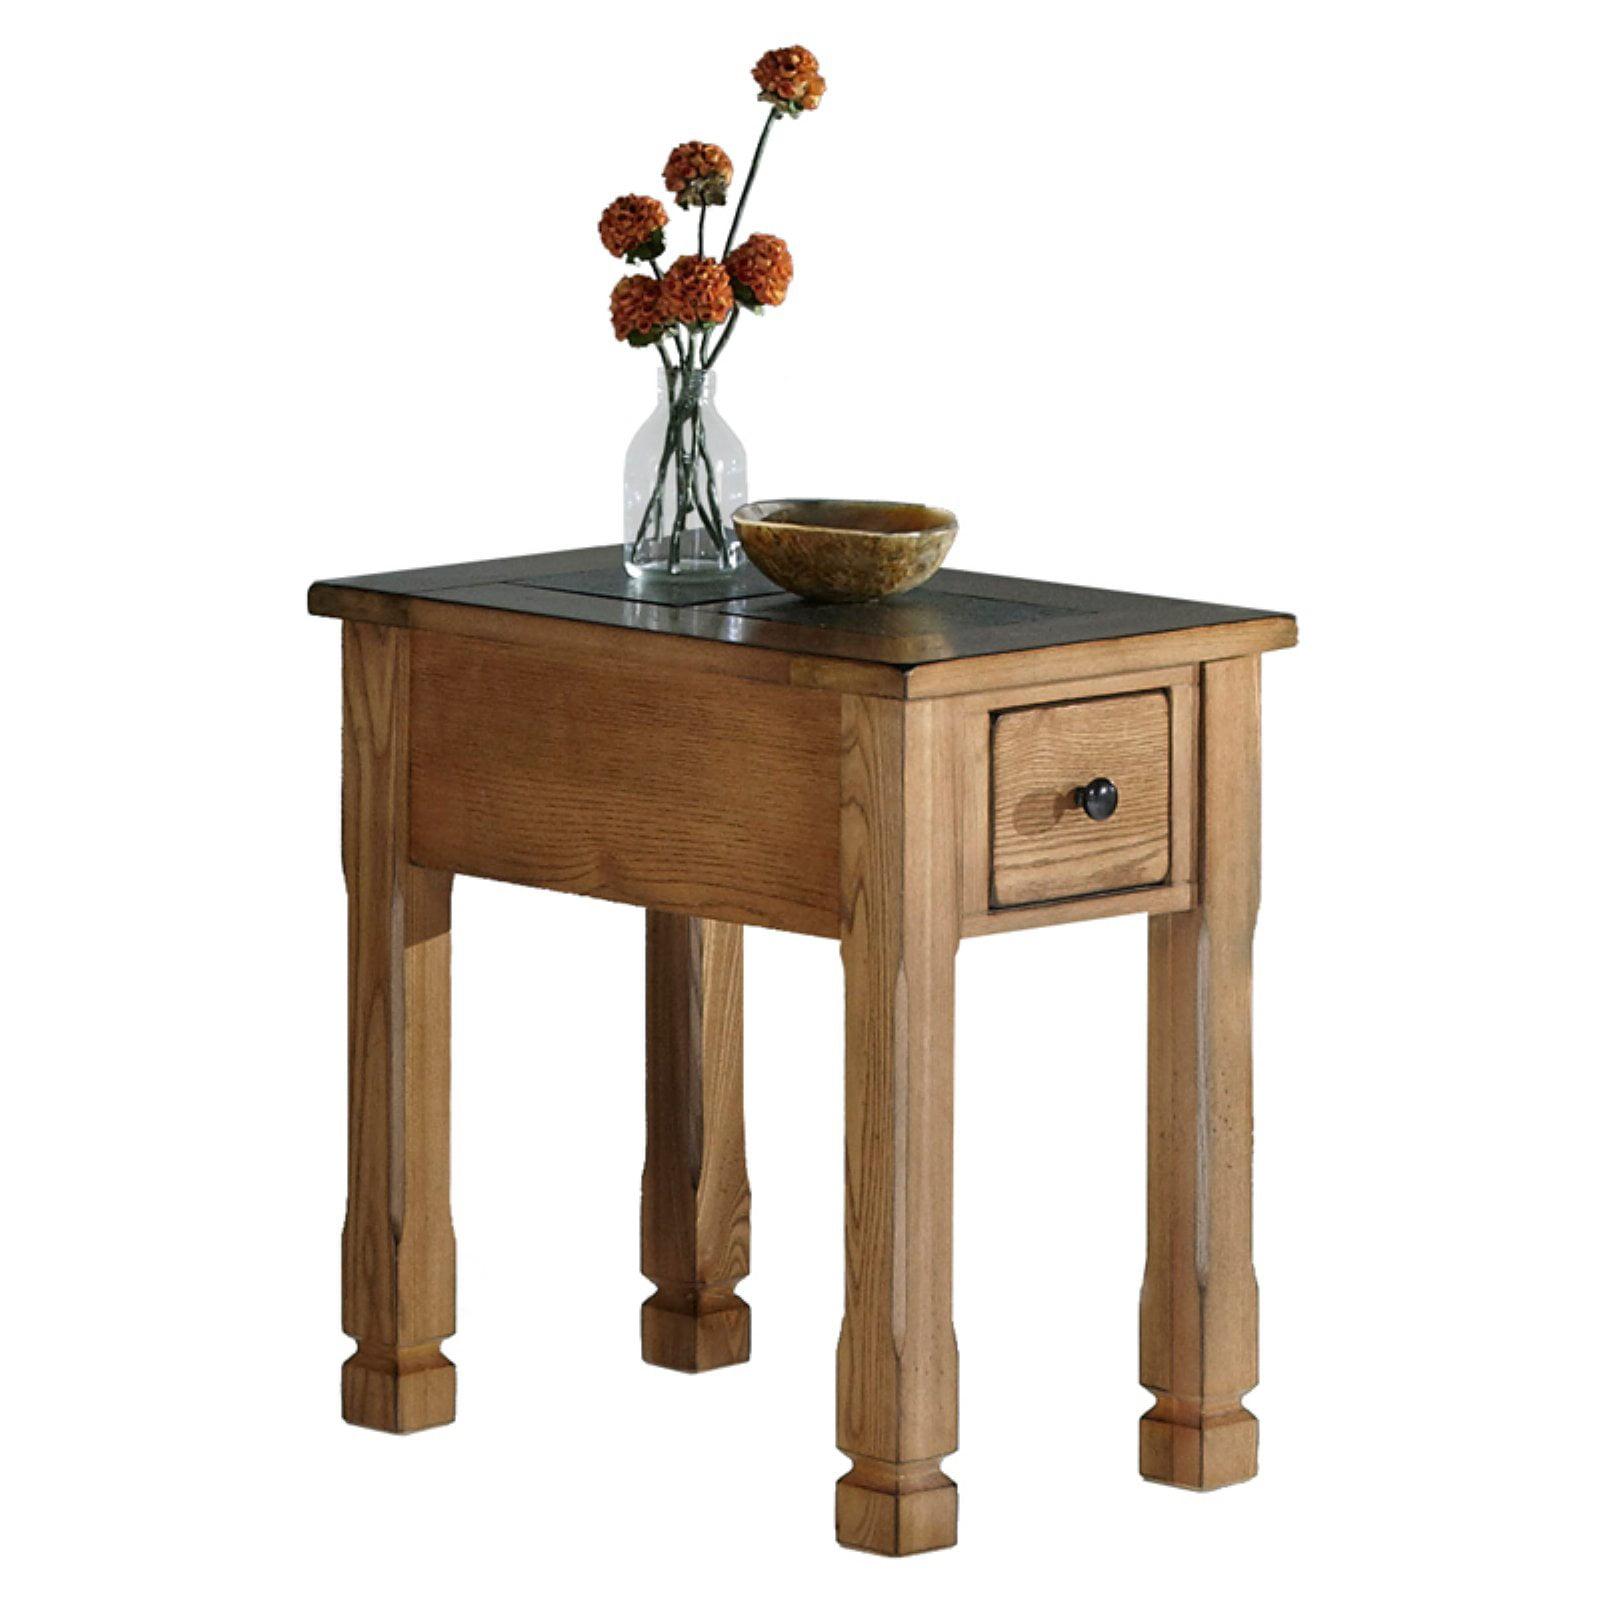 Progressive Furniture Rustic Ridge Chairside Table